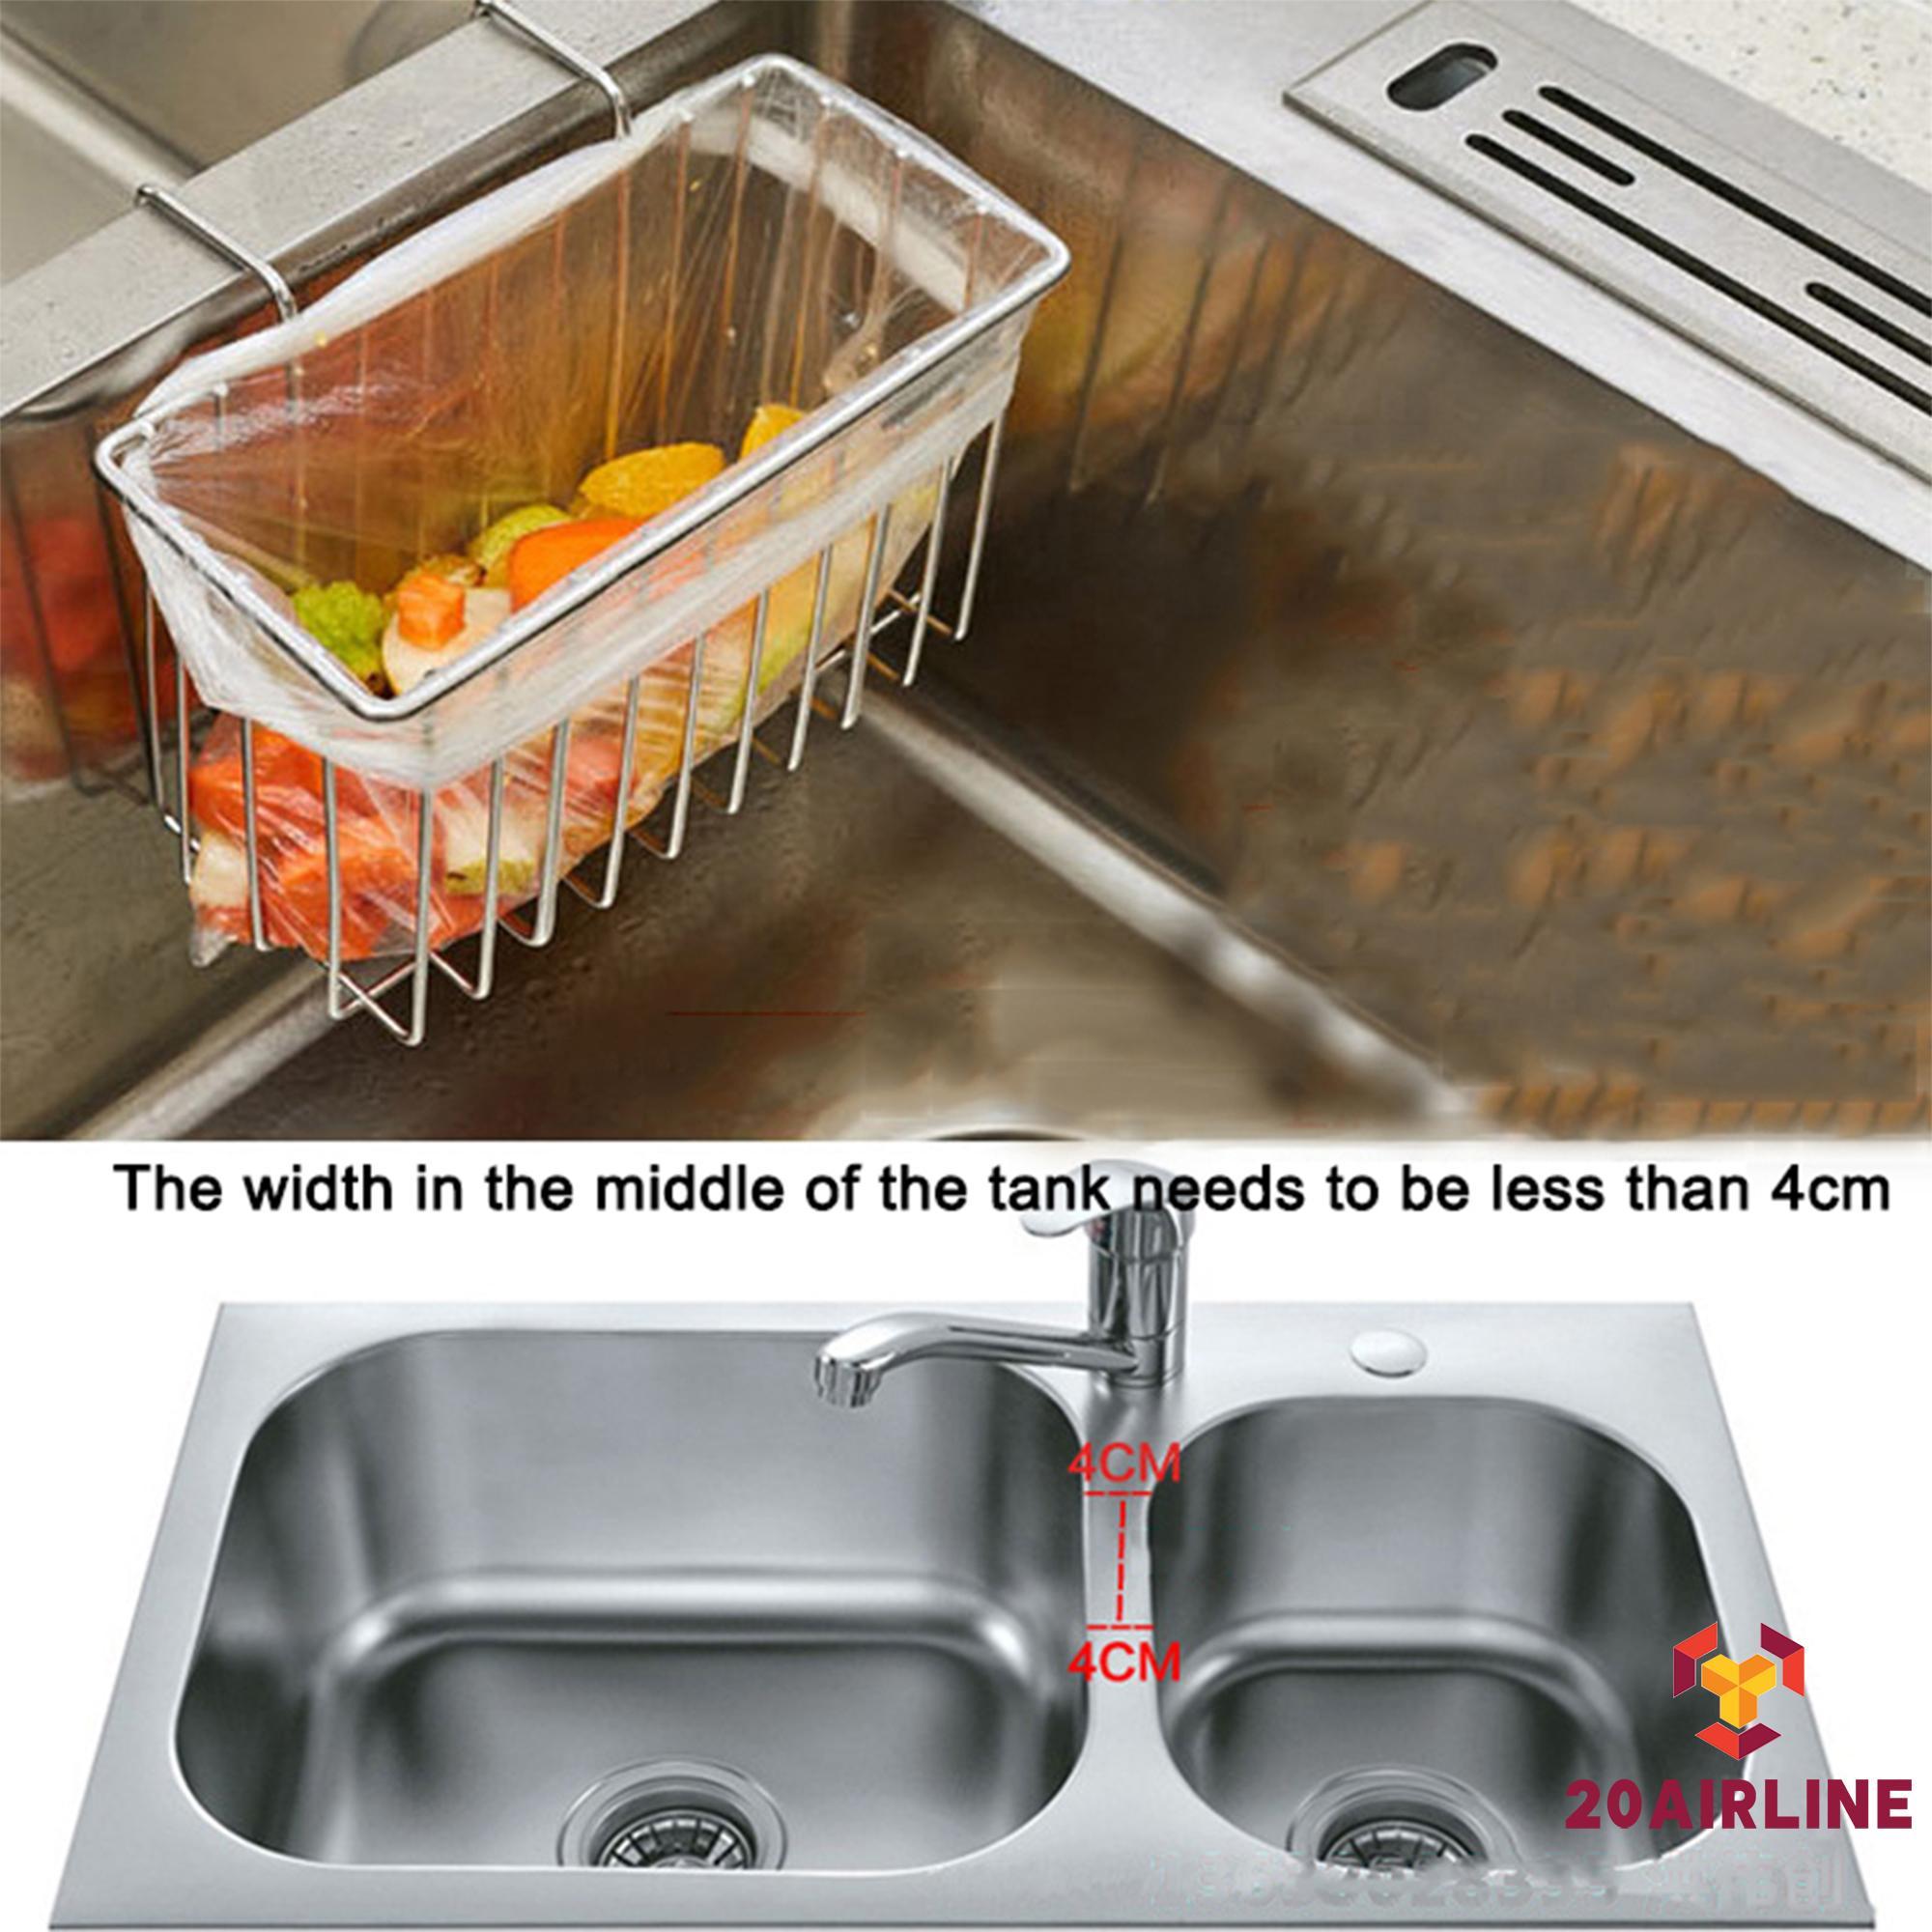 me stainless steel kitchen sponge holder sink brush caddy soap dish washing liquid drainer rack